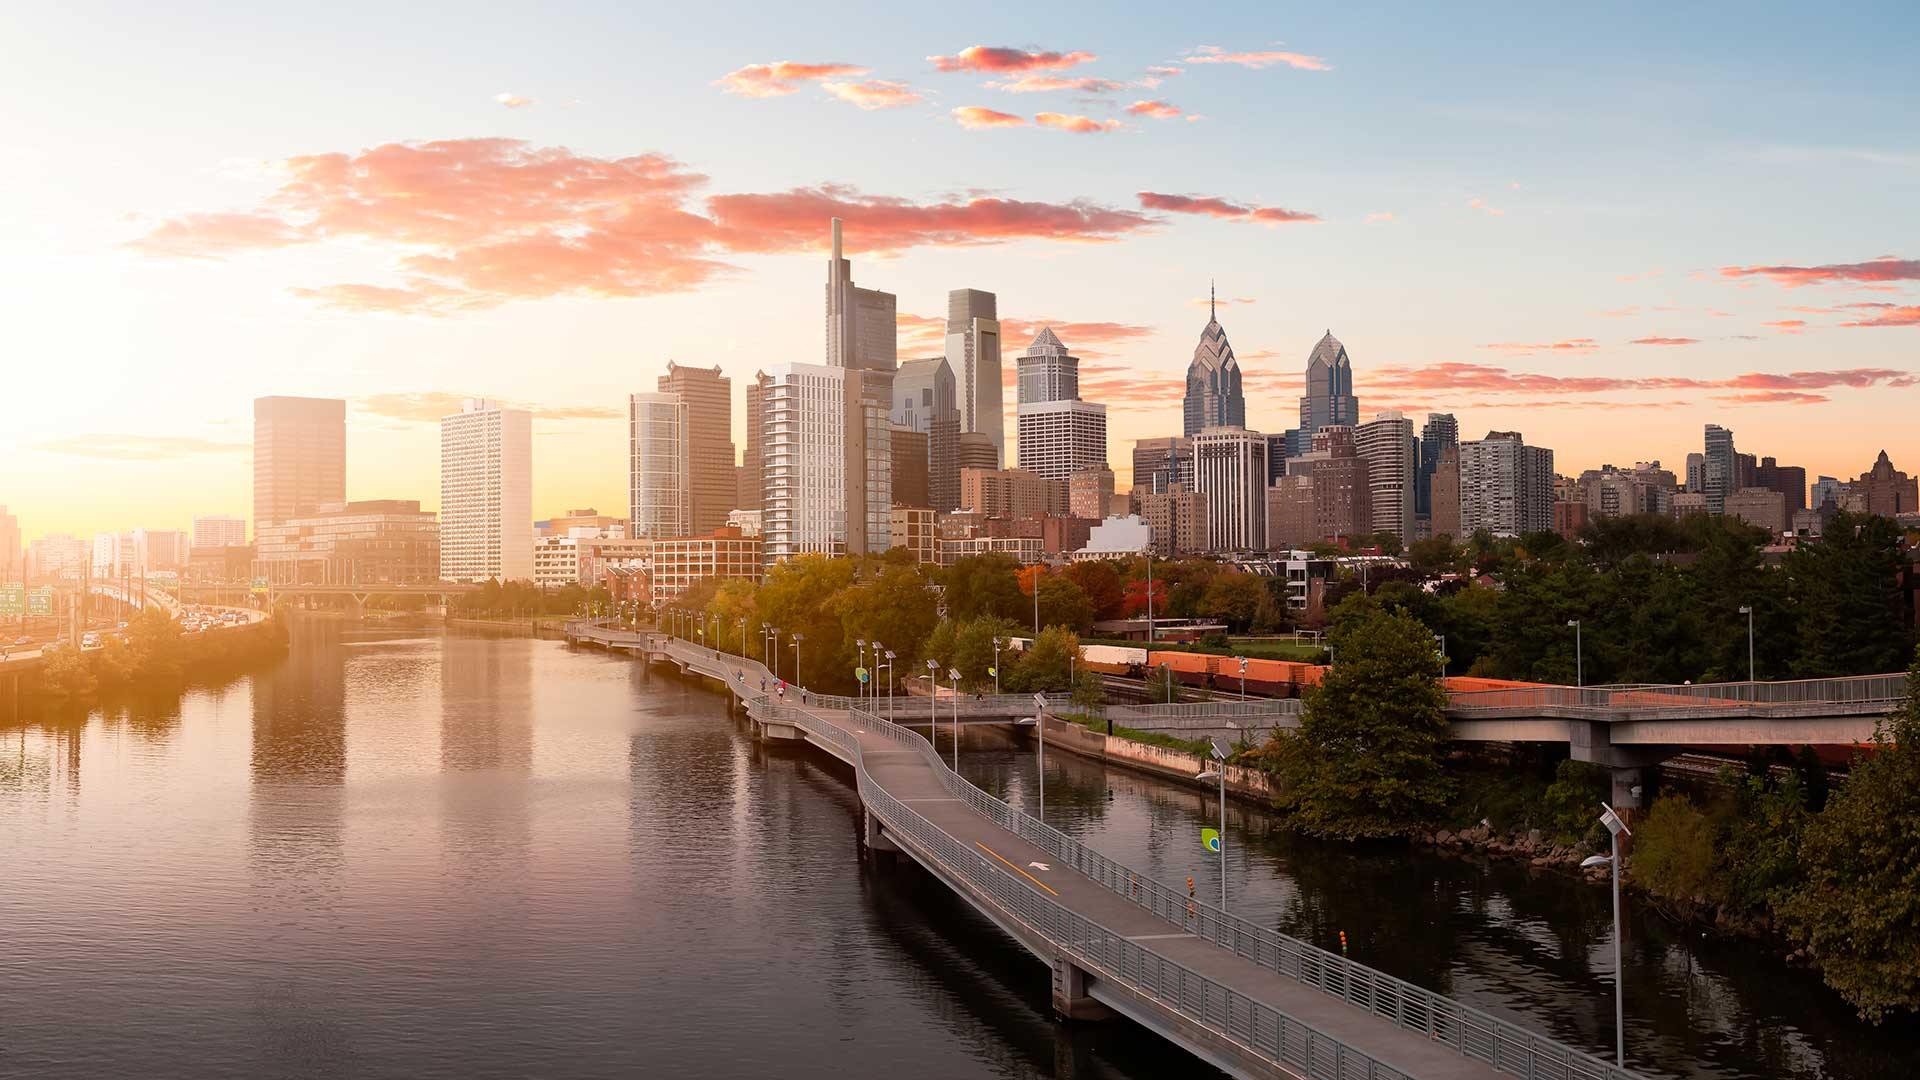 Panorama to illustrate dating in philadelphia